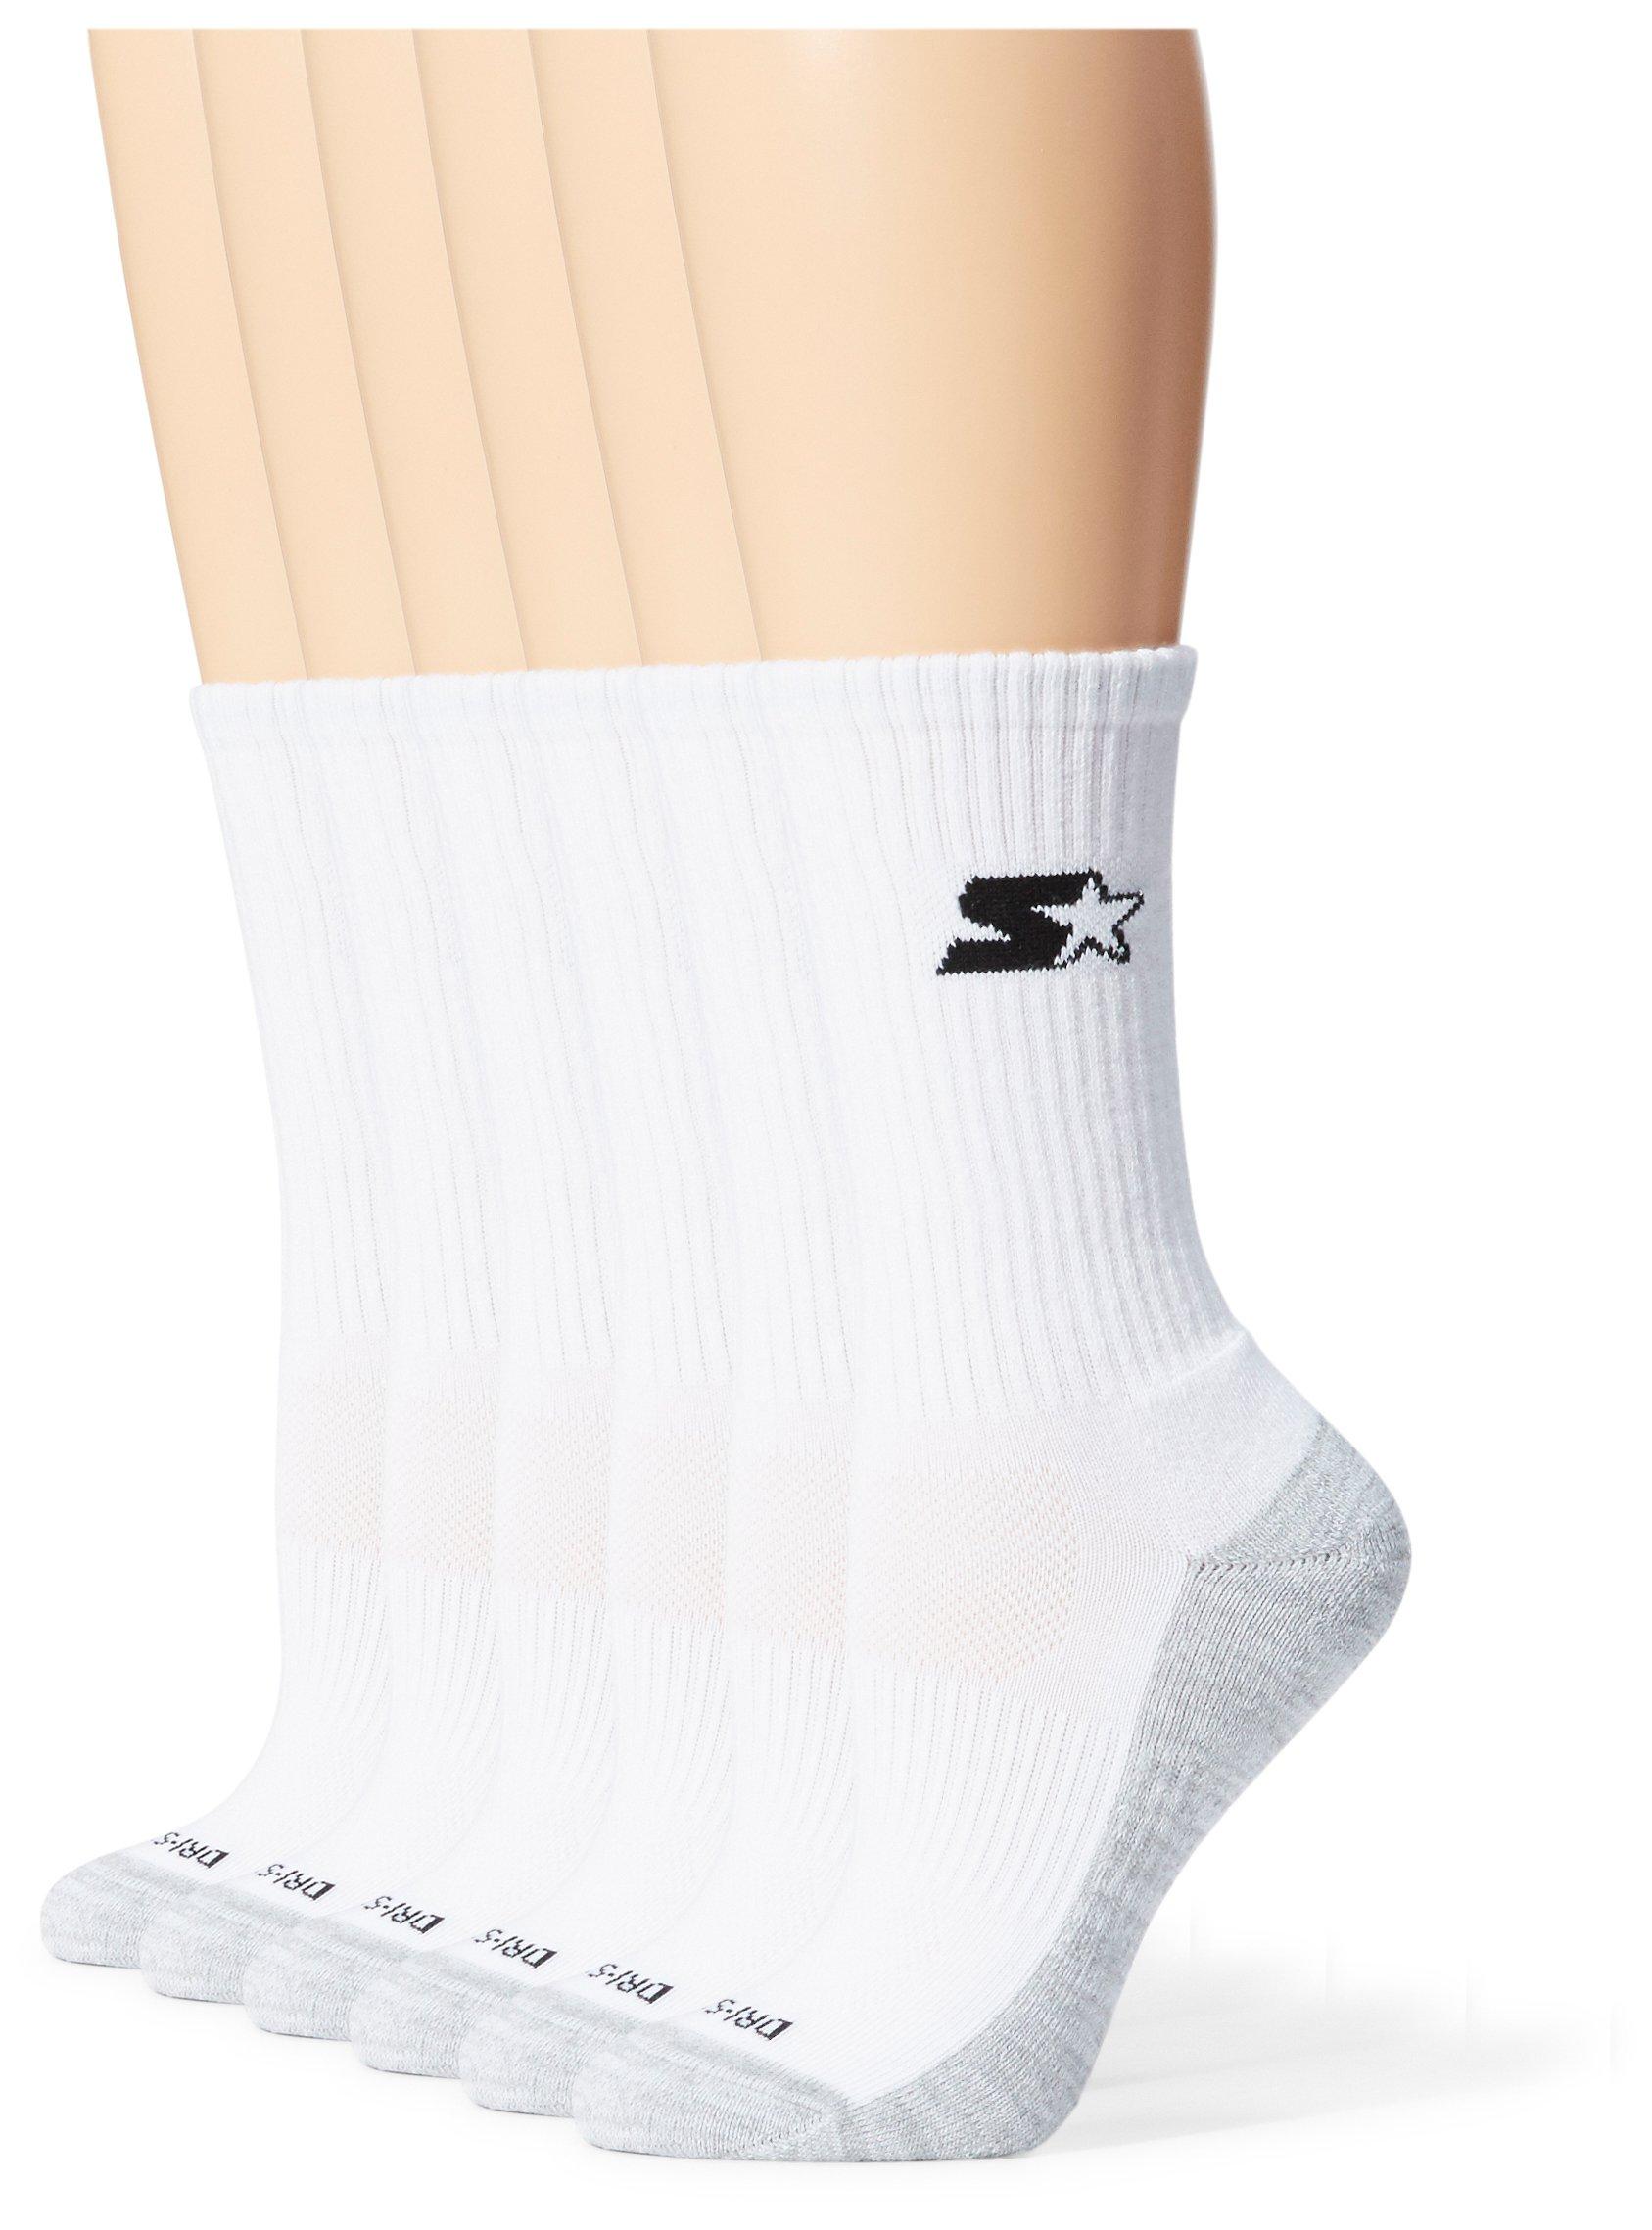 Starter Women's 6-Pack Athletic Crew Socks, Prime Exclusive, White, Medium (Shoe Size 5-9.5)